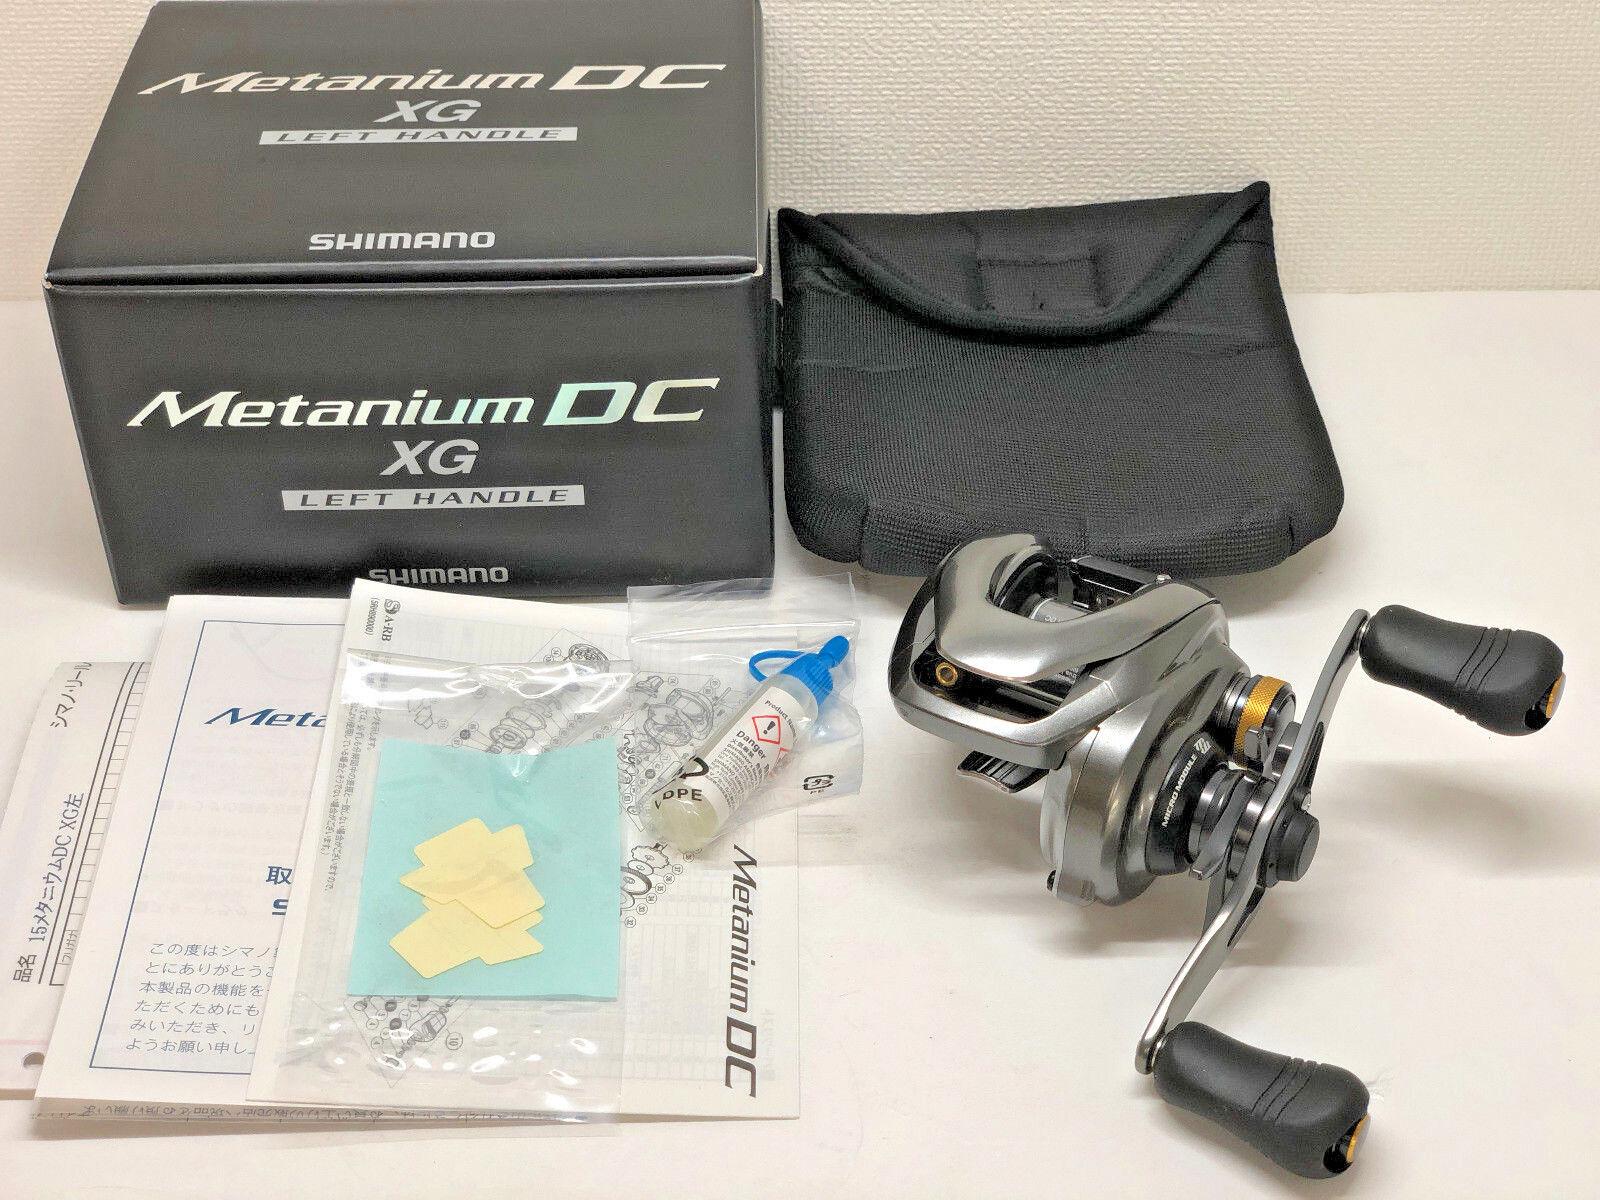 SHIMANO 15 METANIUM DC XG LEFT   - Free Shipping from Japan